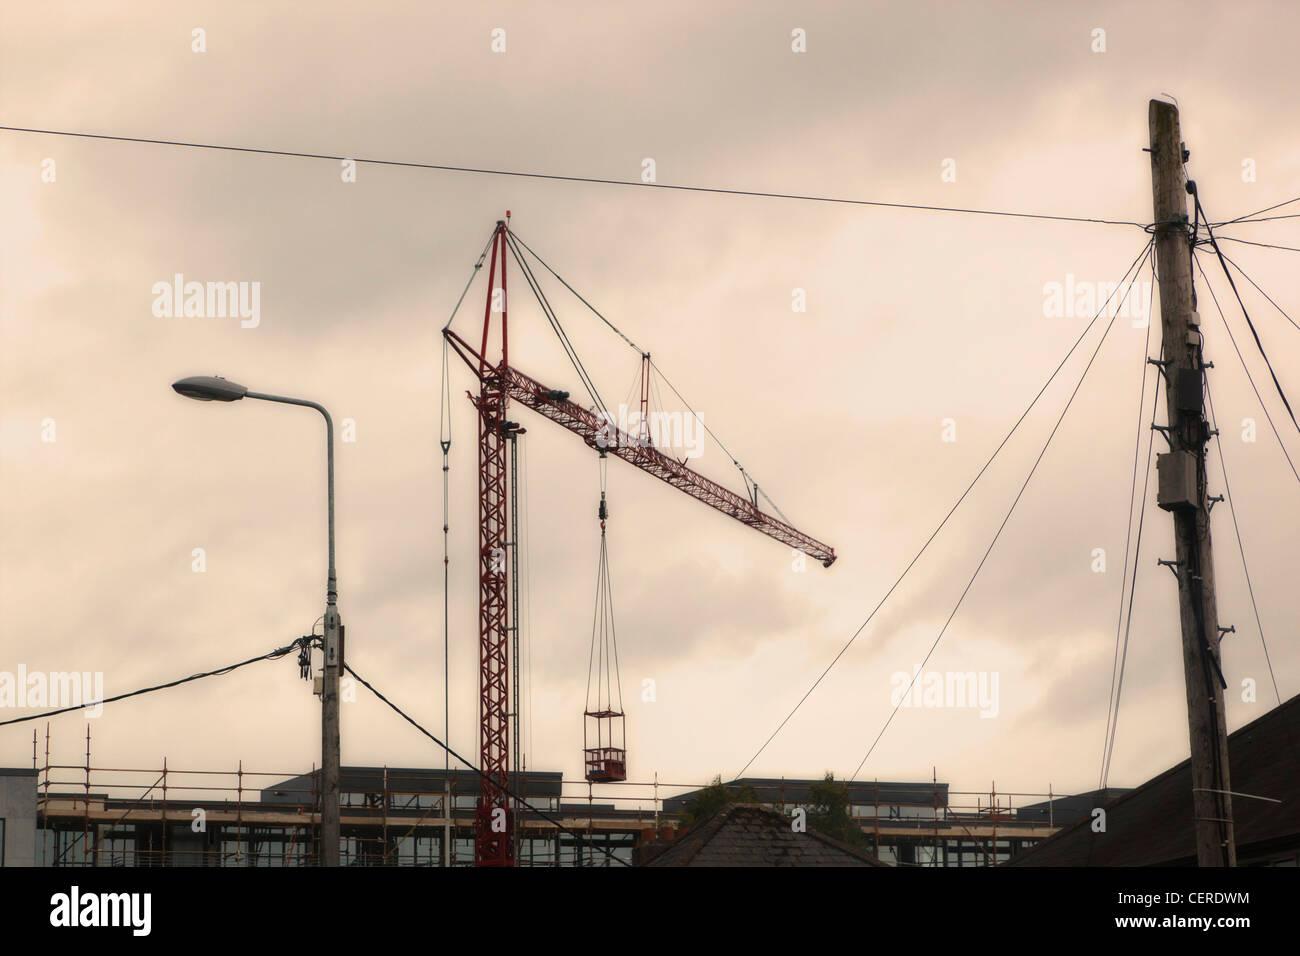 Crane on building site near Cork,County Cork, Republic of Ireland. - Stock Image